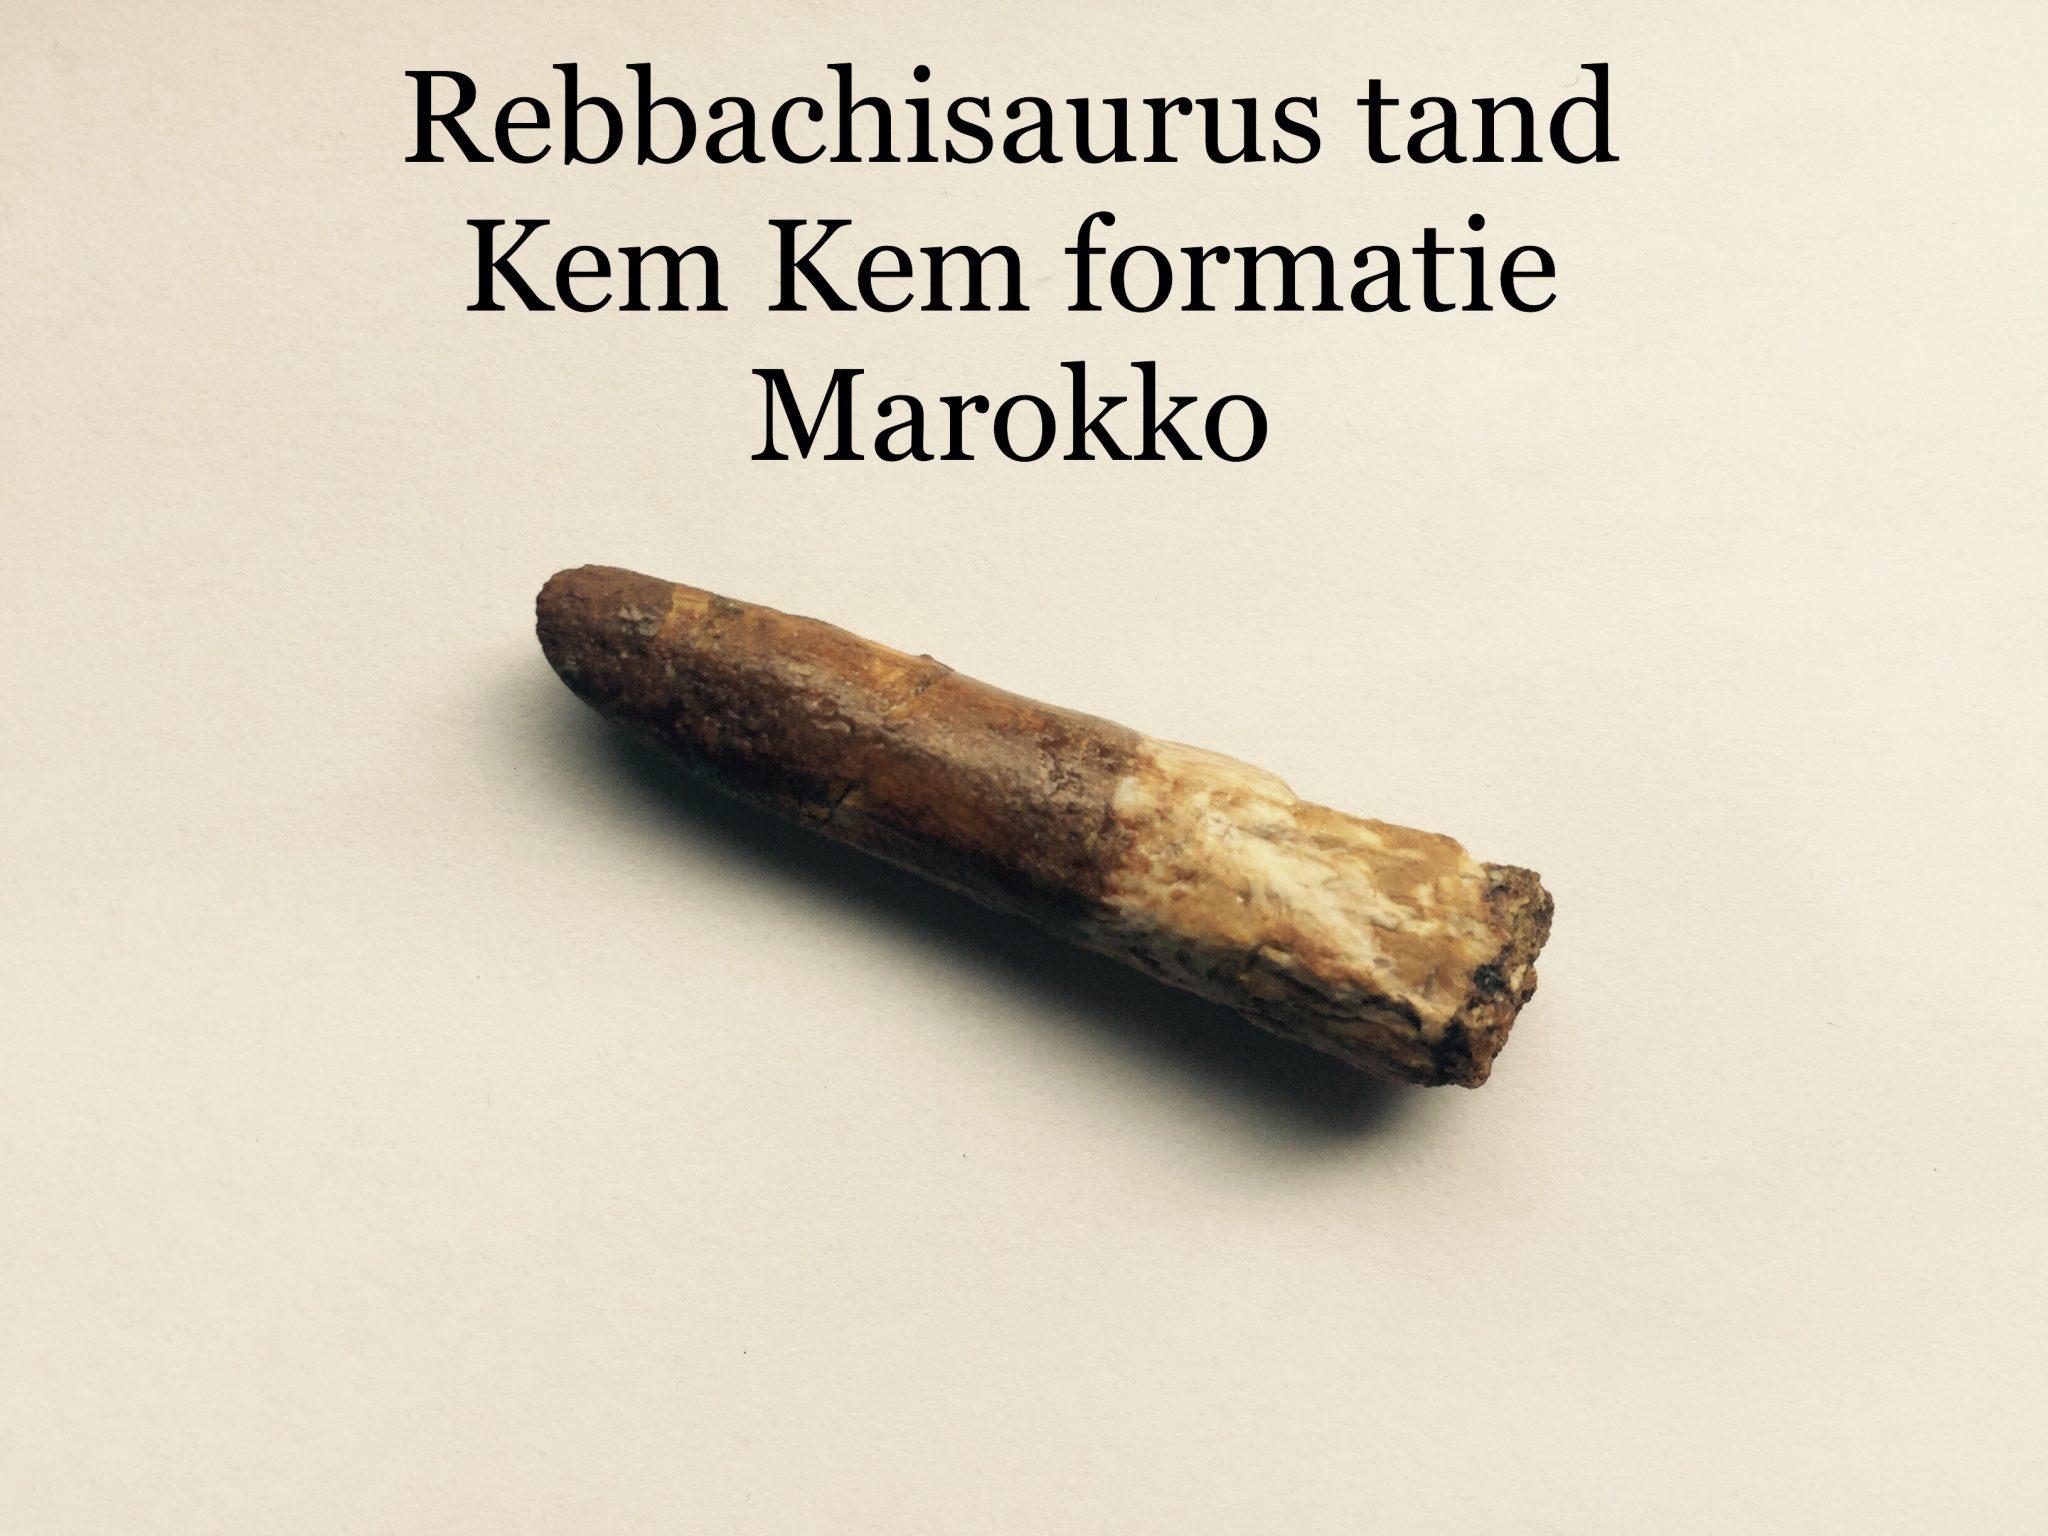 Rebbachisaurus fossiele tand